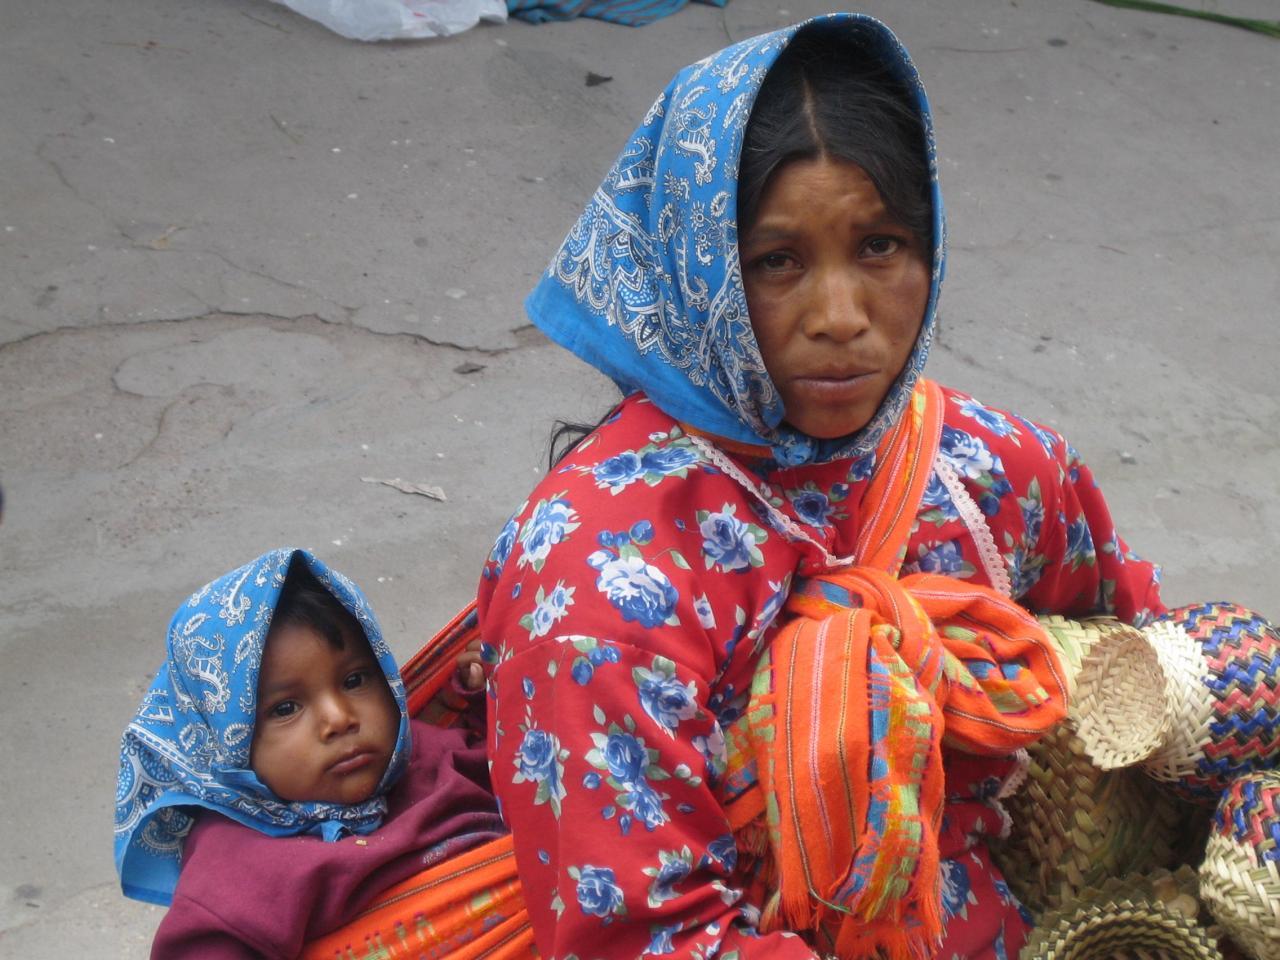 Les indiens Tarahumaras